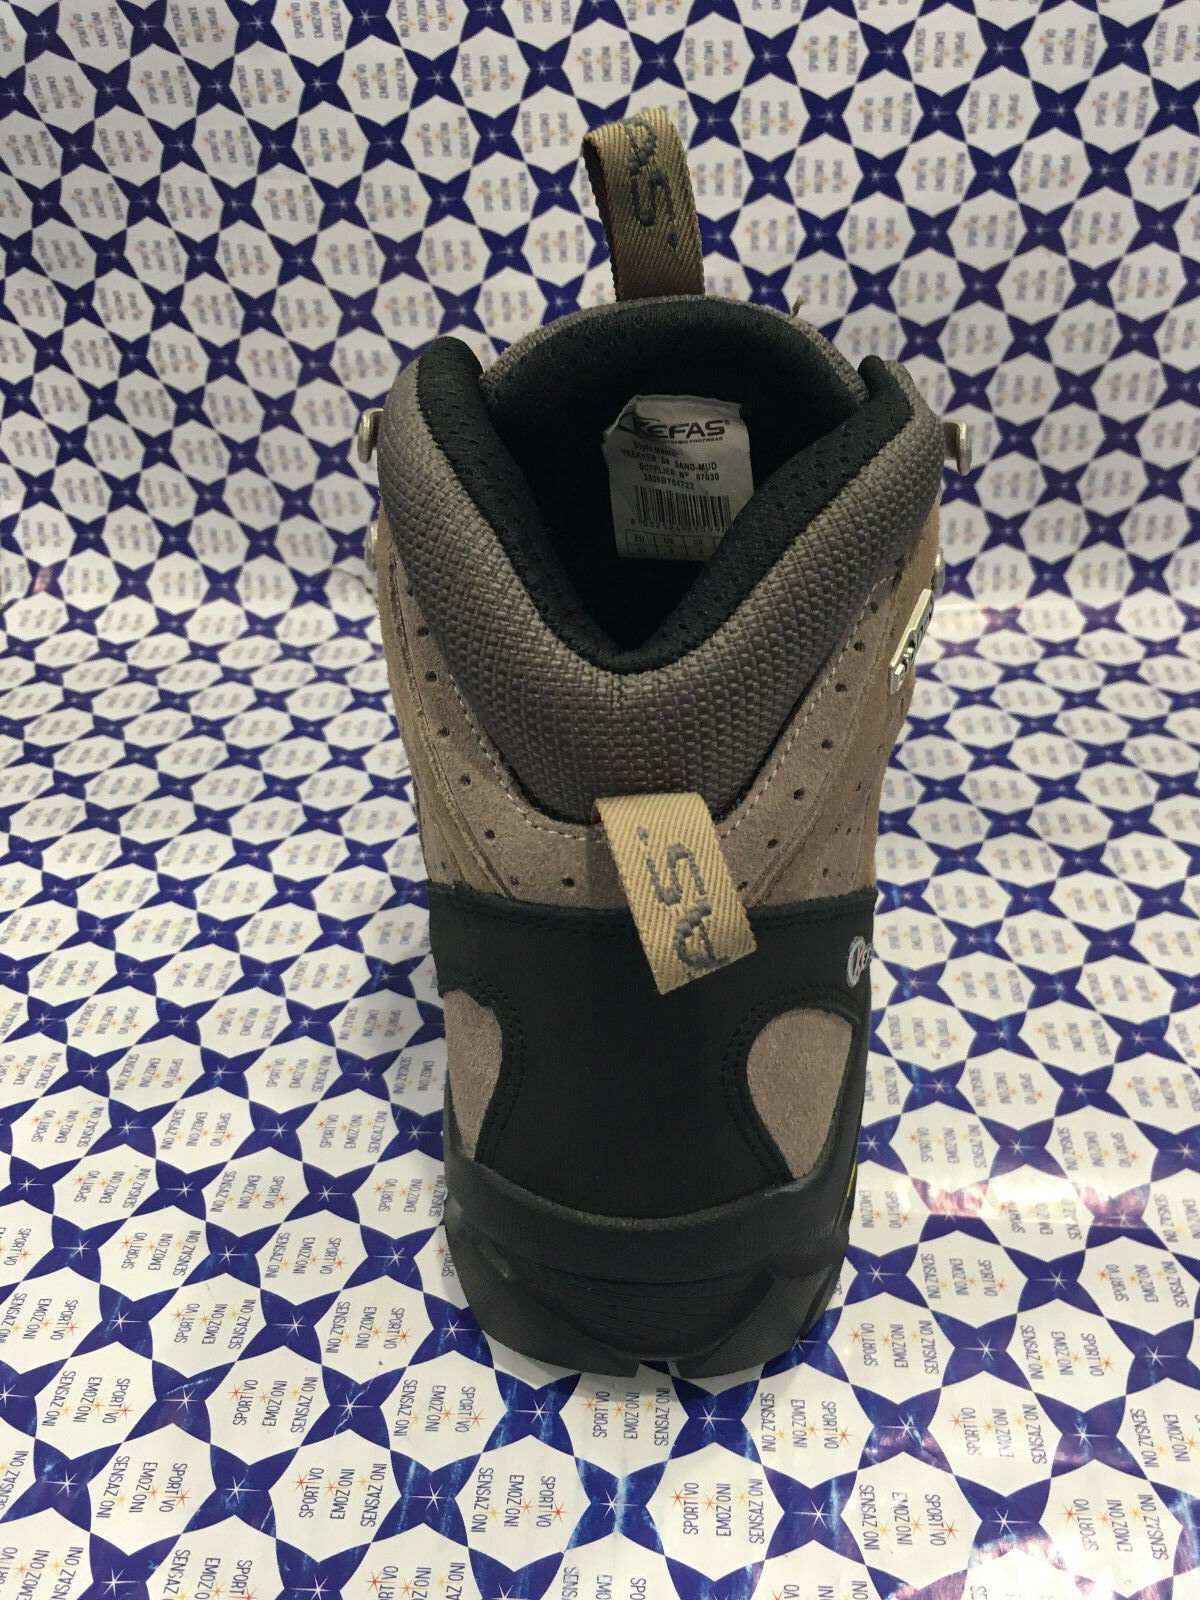 Schuhe Trekking kefas Herren Herren Herren - discover 06 grau schwarz Schlamm - 3450BY 3336BY 6ef24f